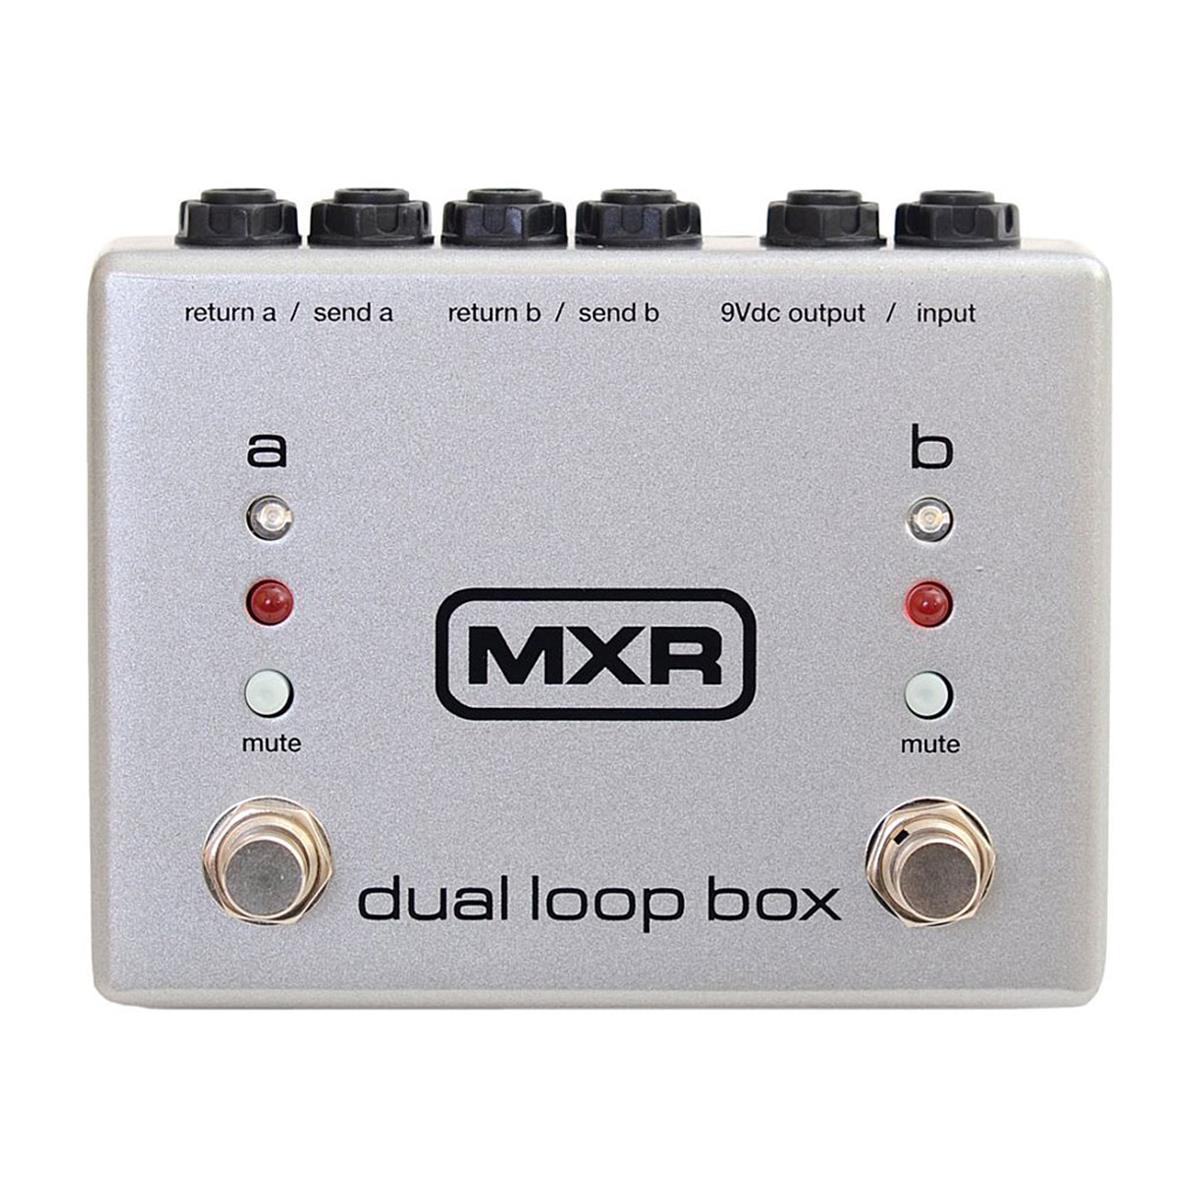 MXR-M198-MXR-DUAL-LOOP-BOX-sku-13583